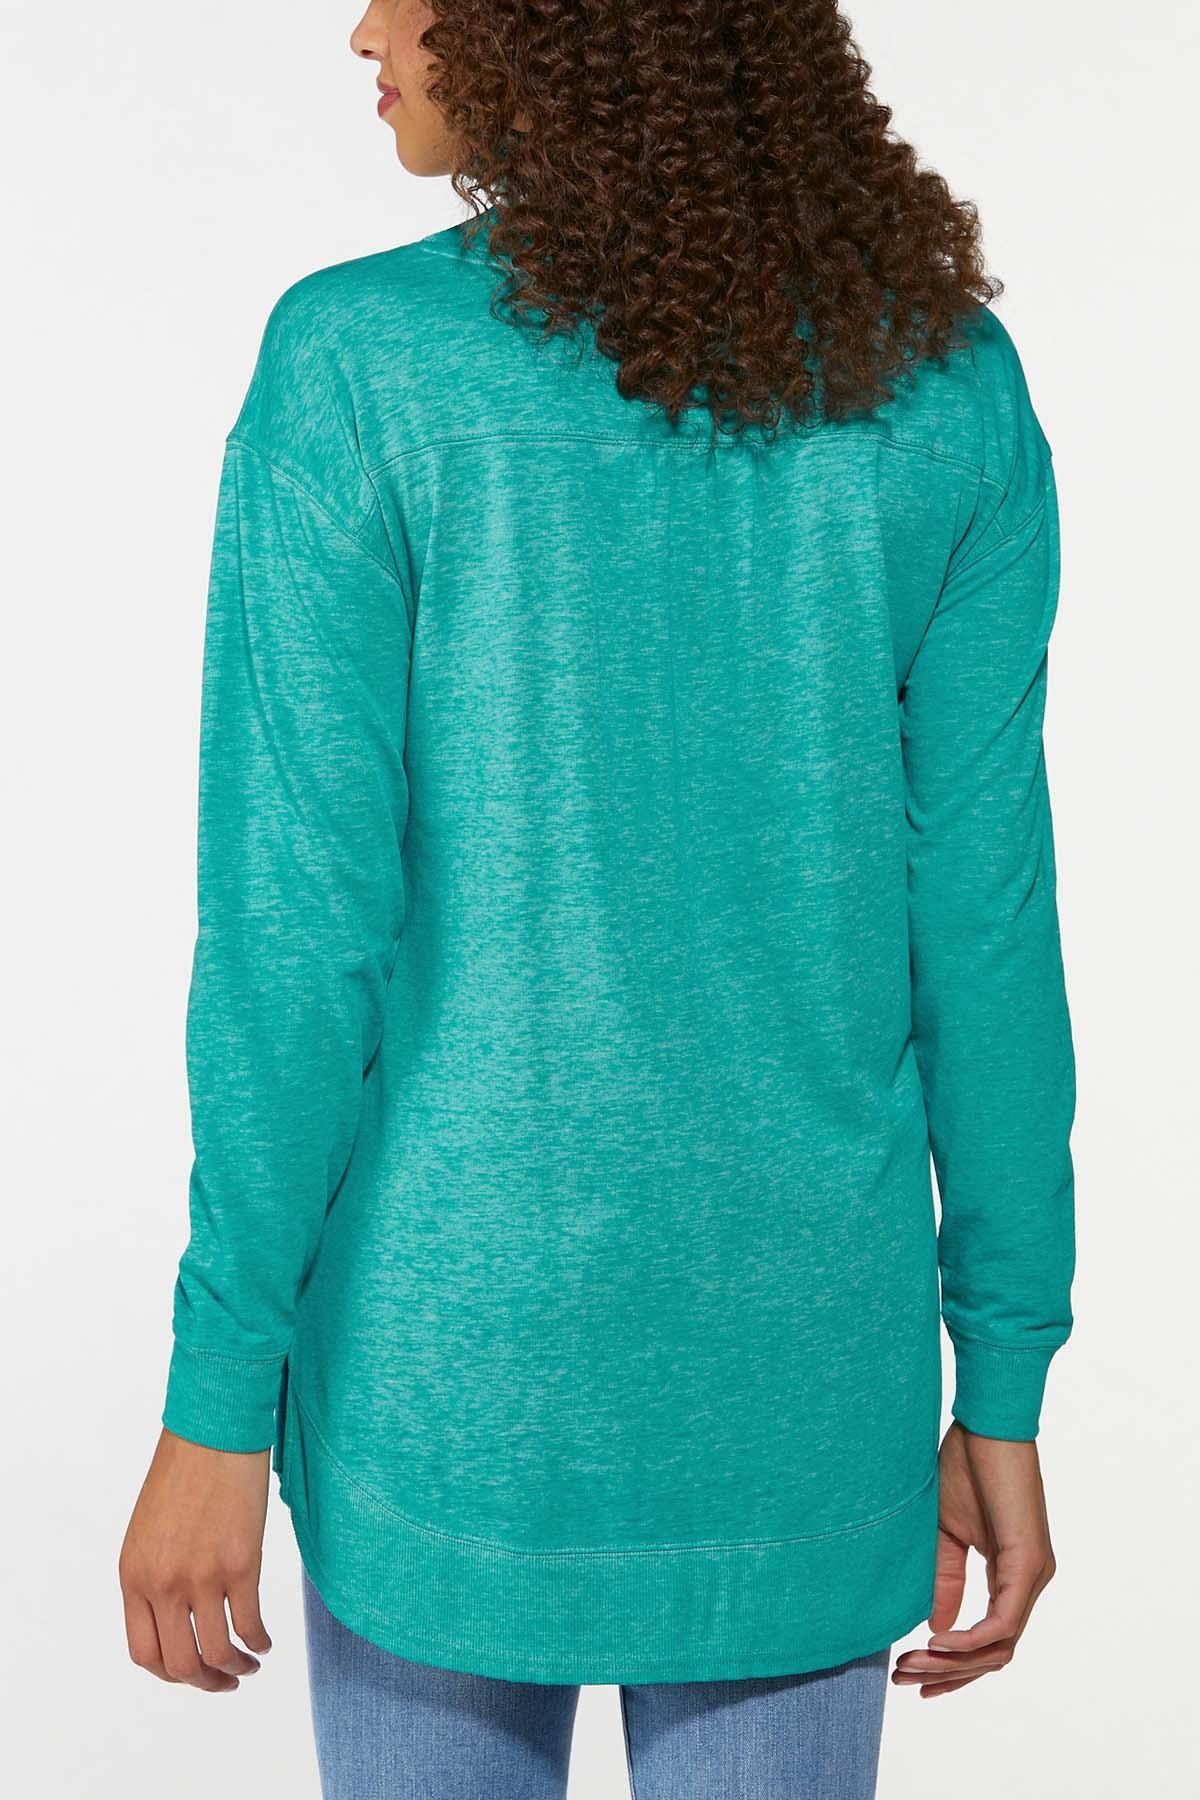 Plus Size Teal Sweatshirt Tunic (Item #44702626)